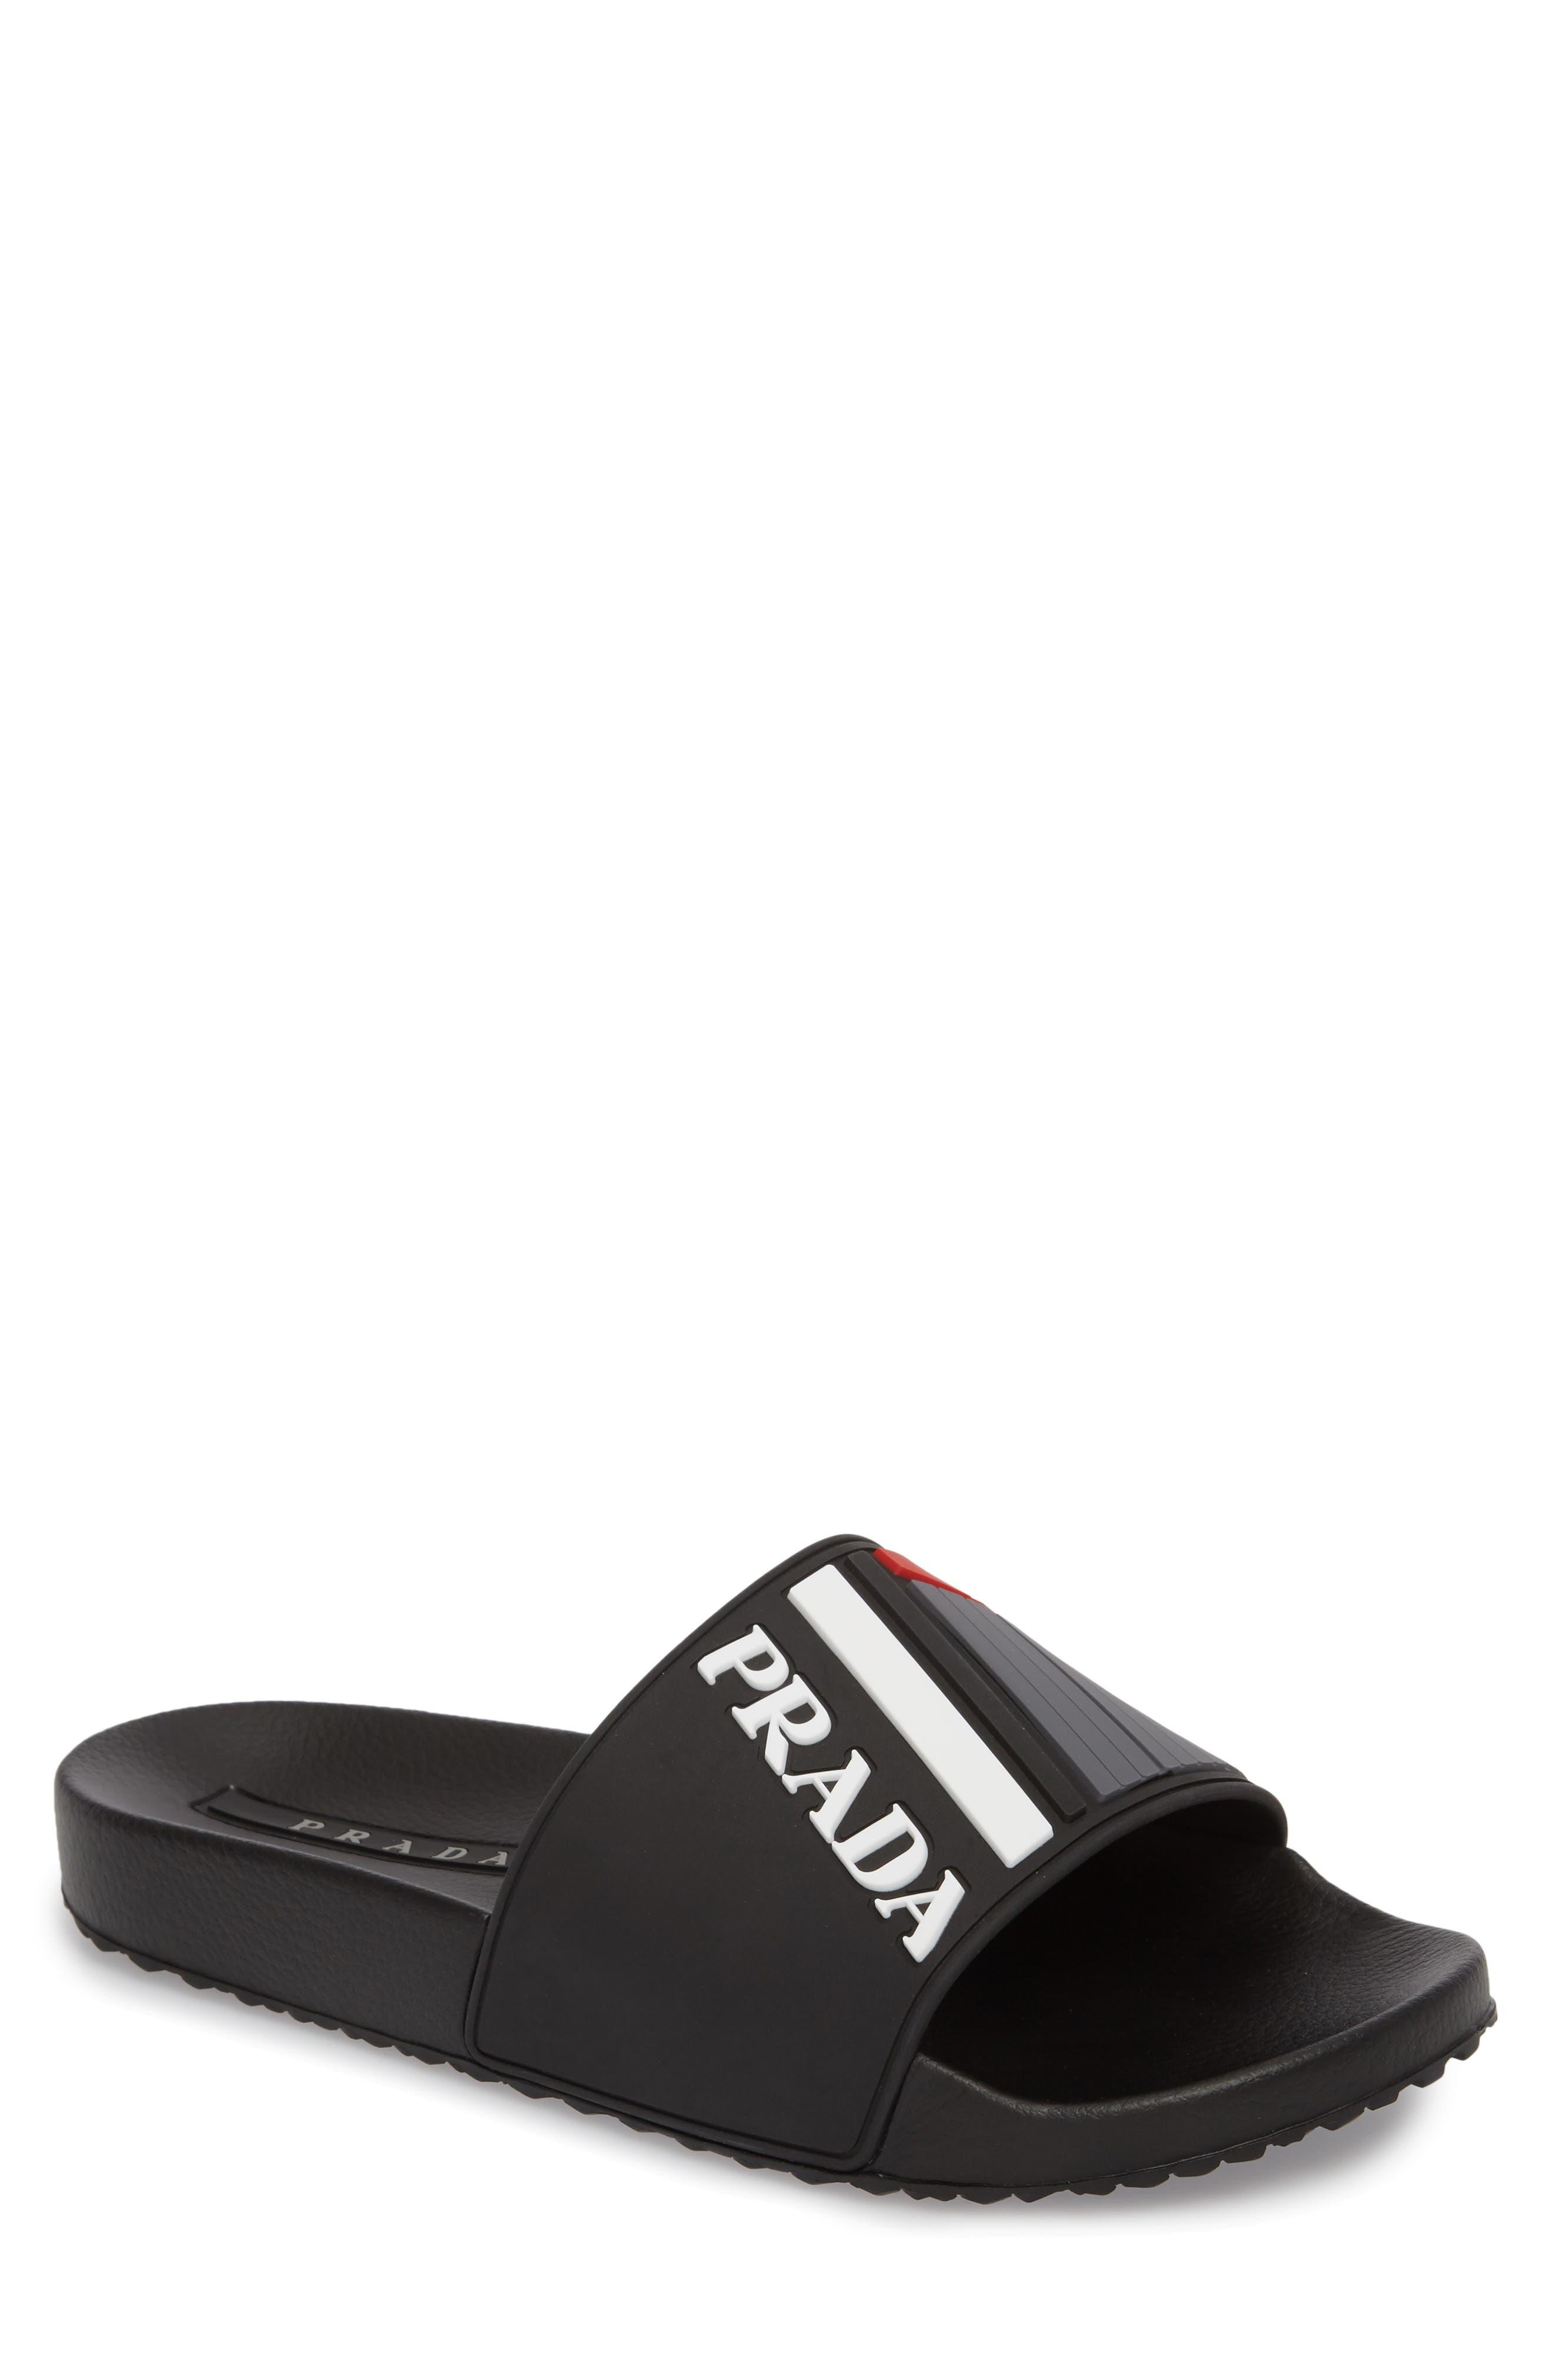 Linea Rossa Logo Slide Sandal,                         Main,                         color, NERO BIANCO